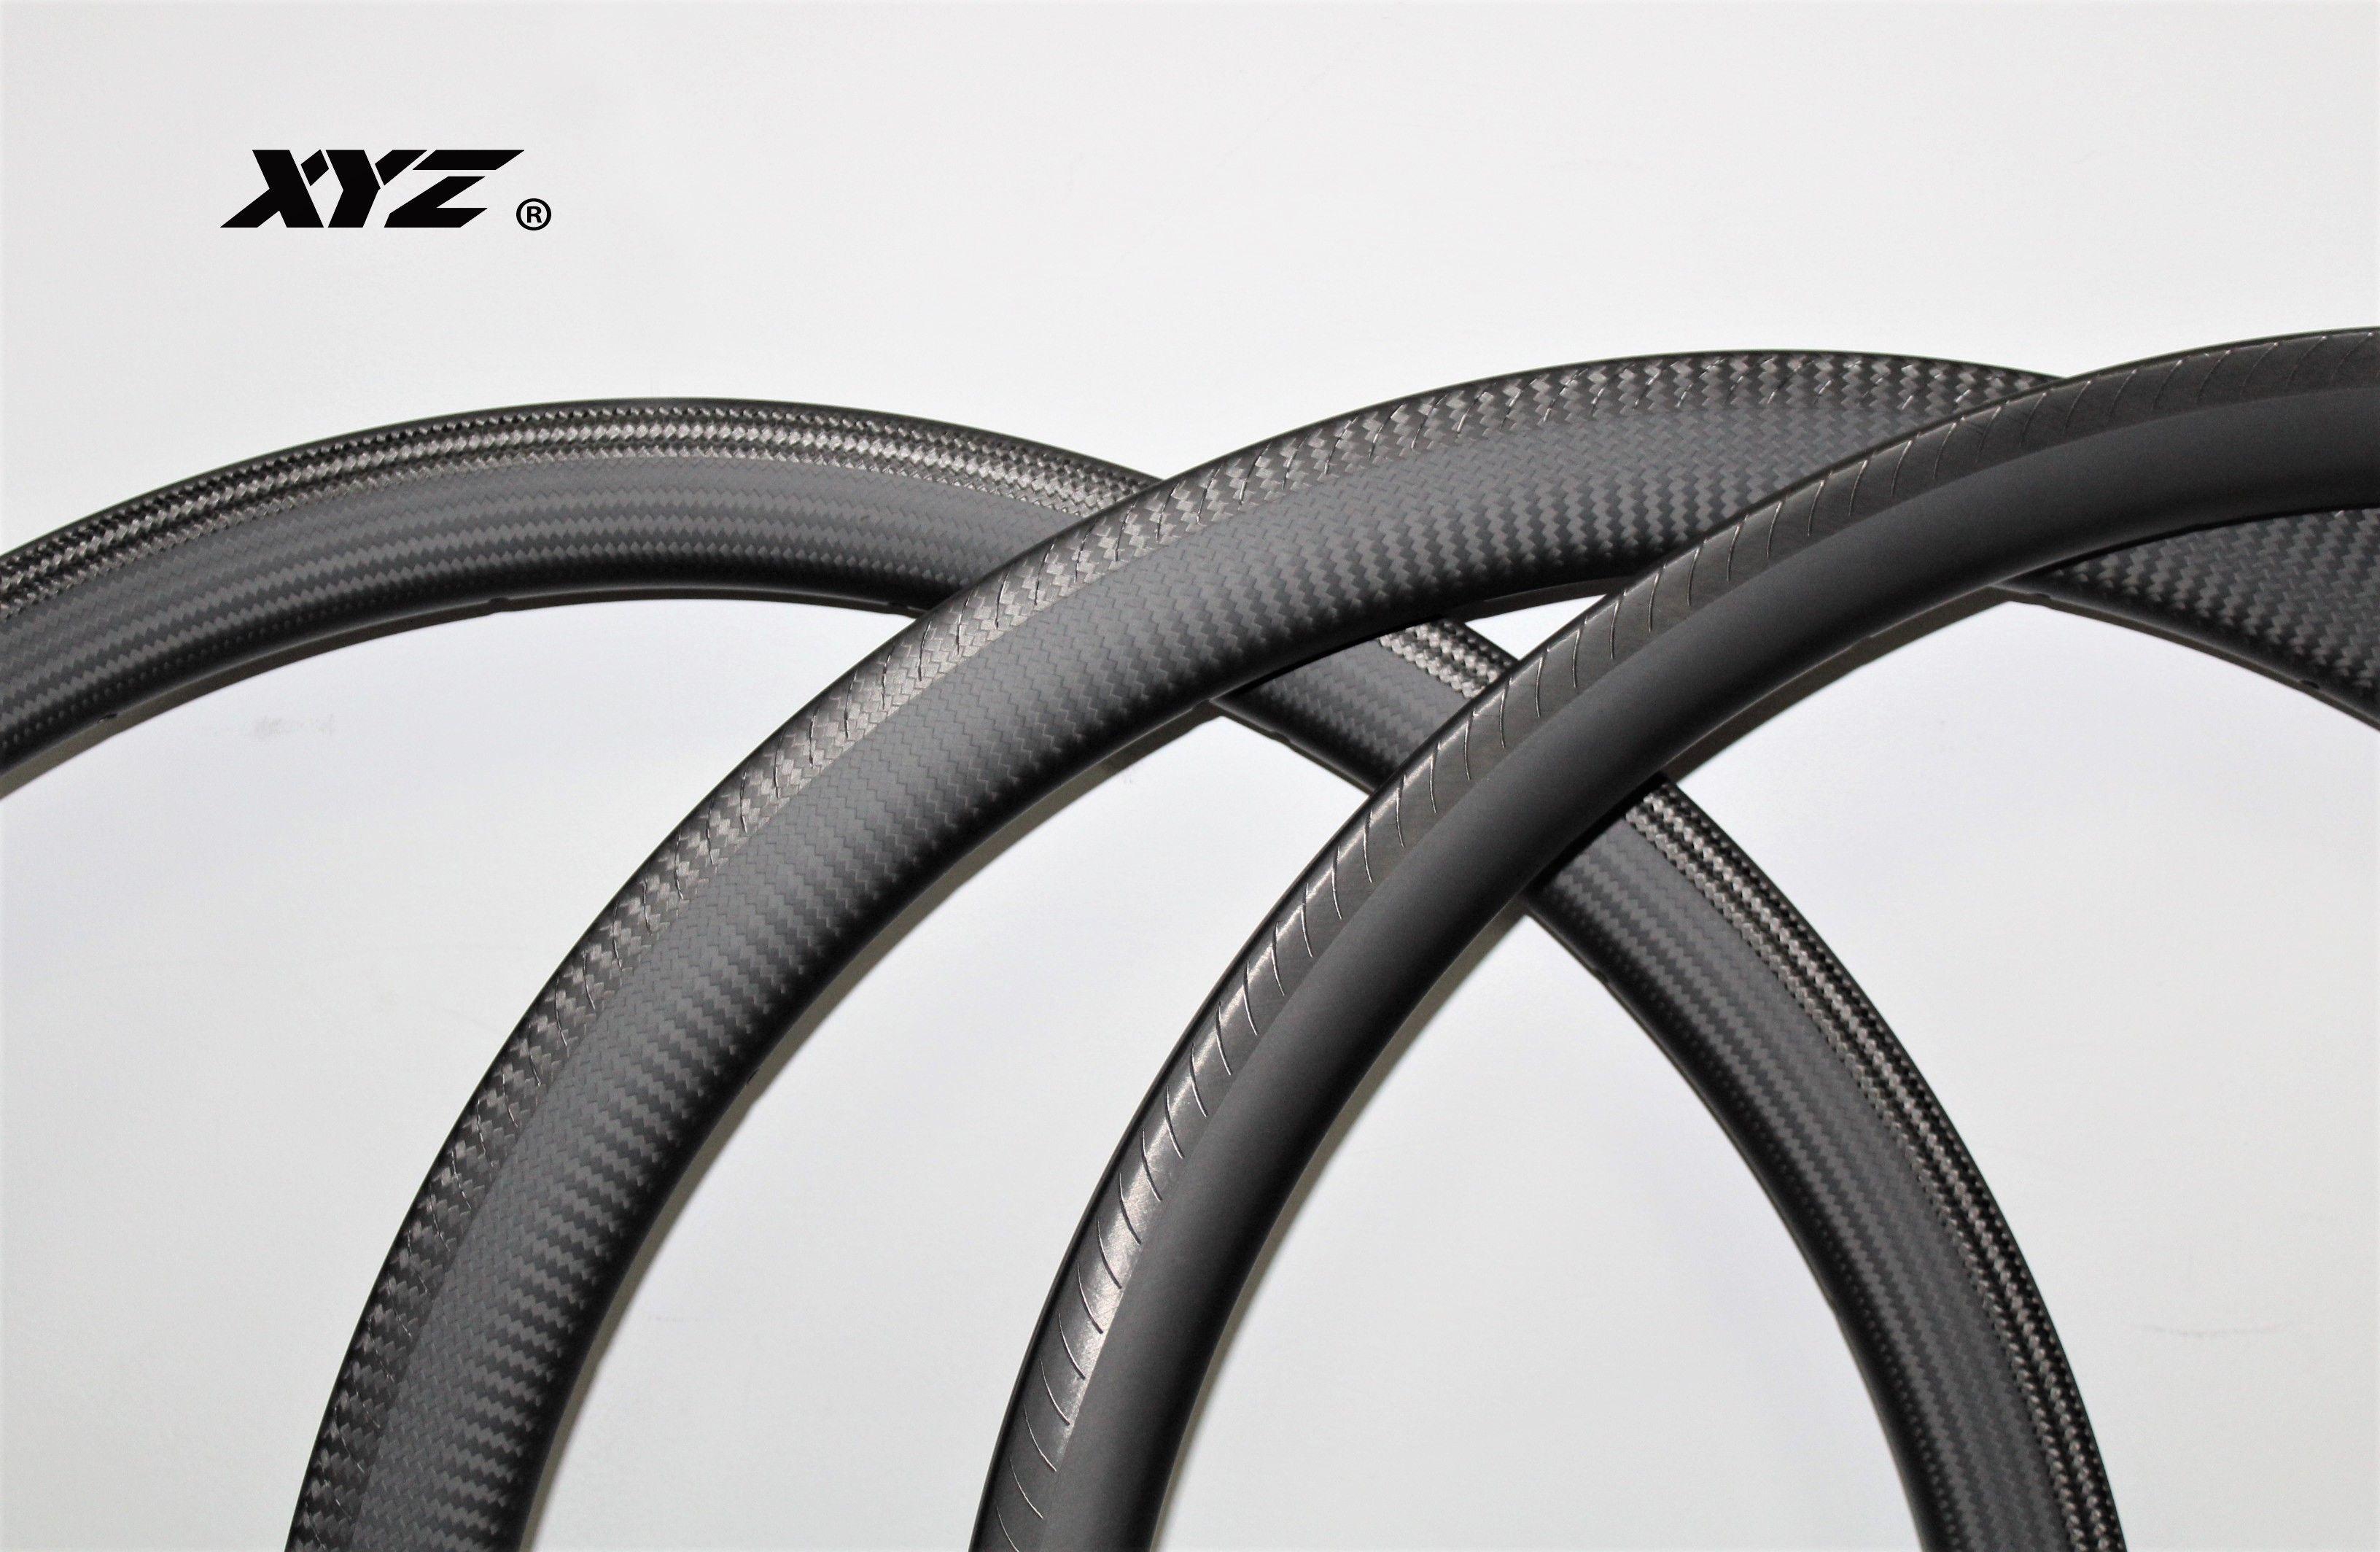 This Is The Xyz Best Graphene Series Carbon Fiber Bike Road Rims